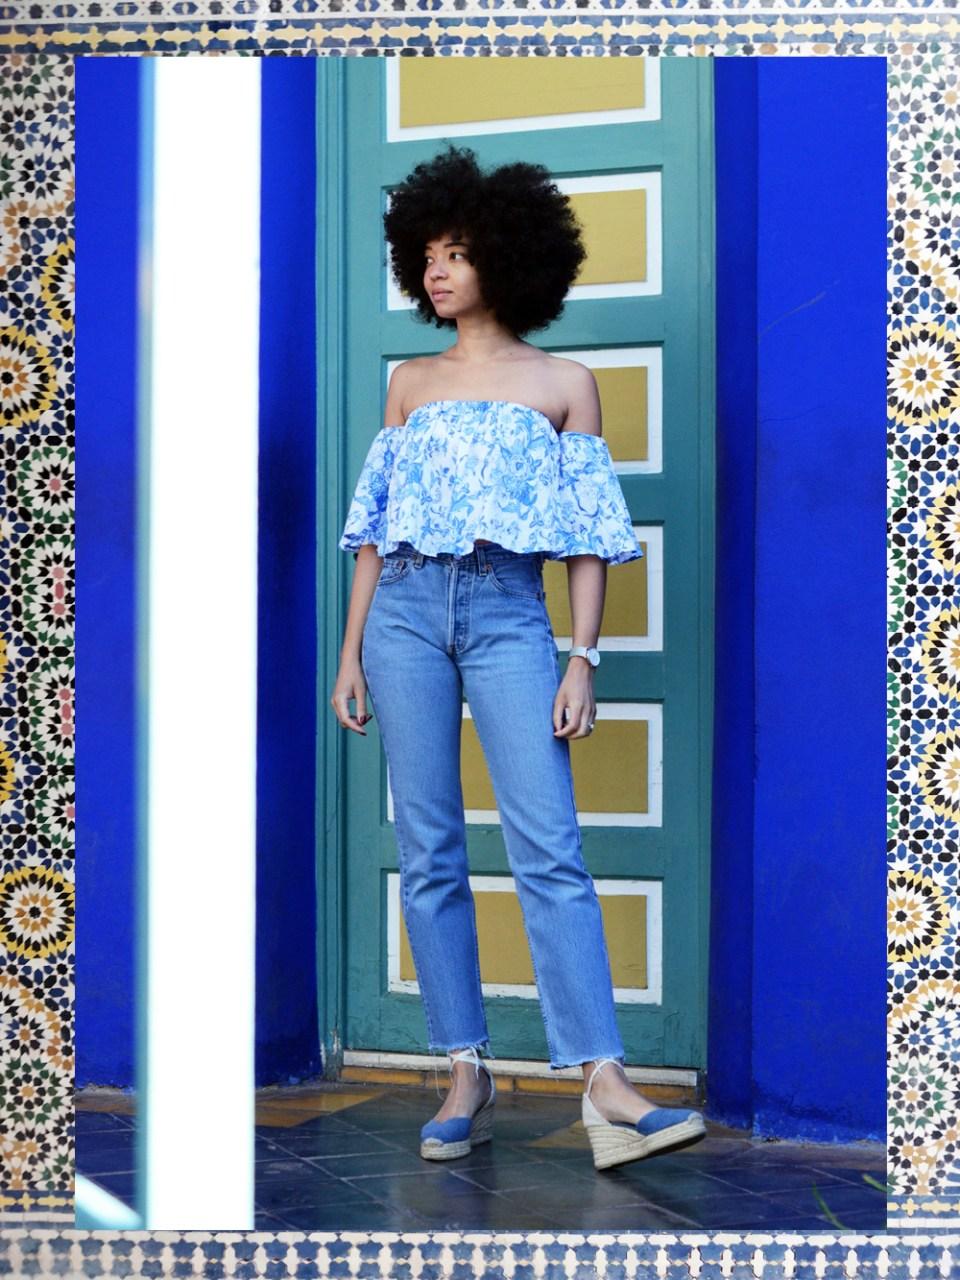 1-mercredie-blog-mode-geneve-suisse-blogueuse-bloggeuse-geneva-swiss-maroc-marocco-trip-marrakech-marrakesh-majorelle-jardin-fashion